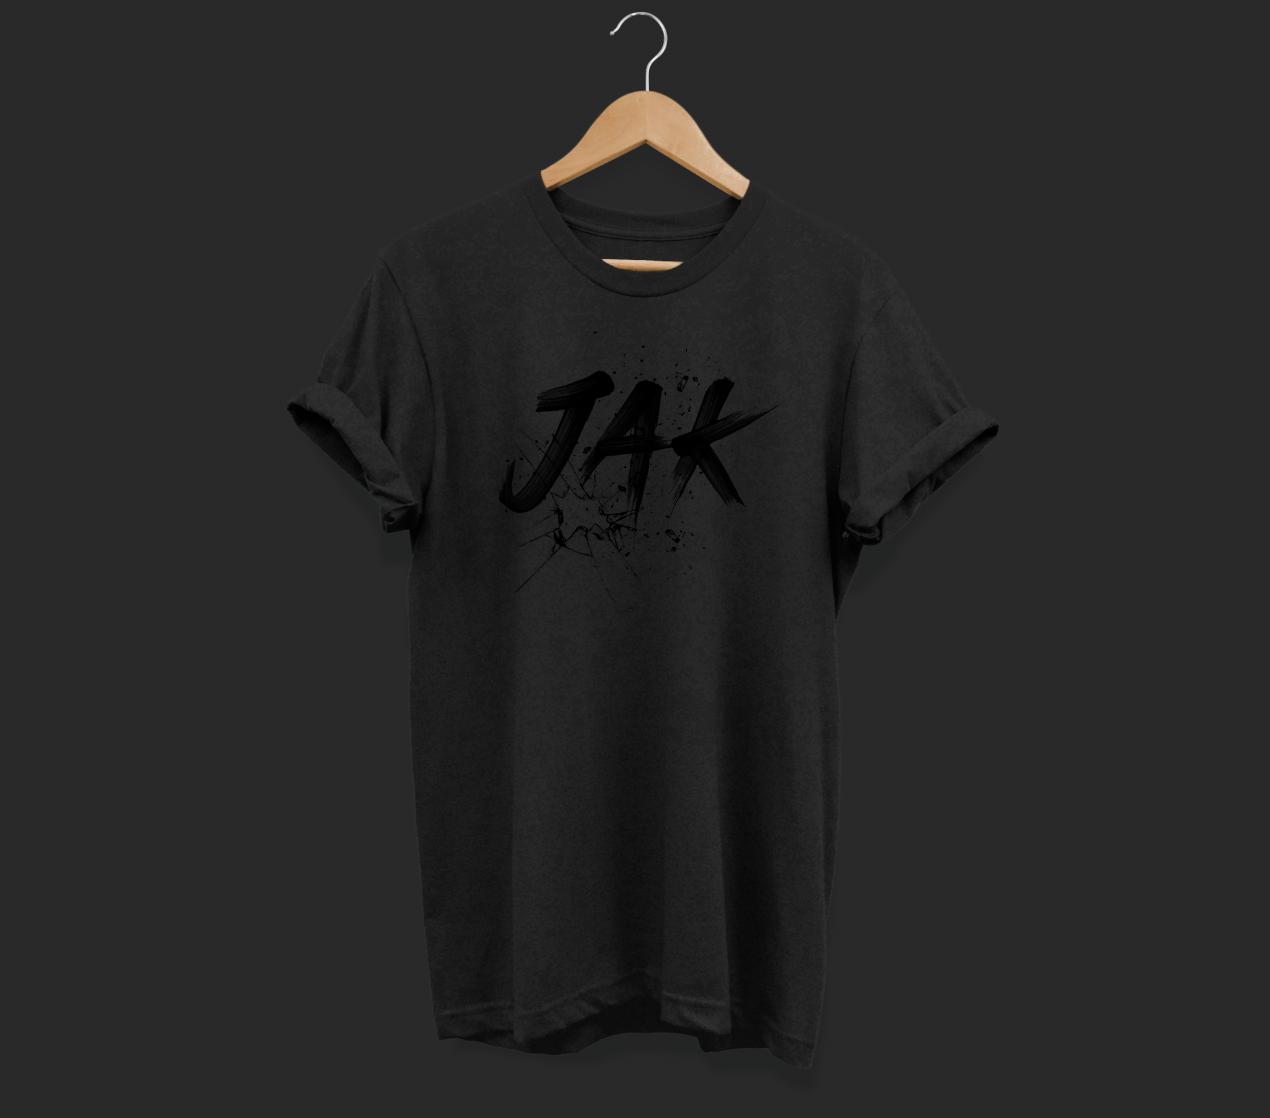 T-shirt-1.png